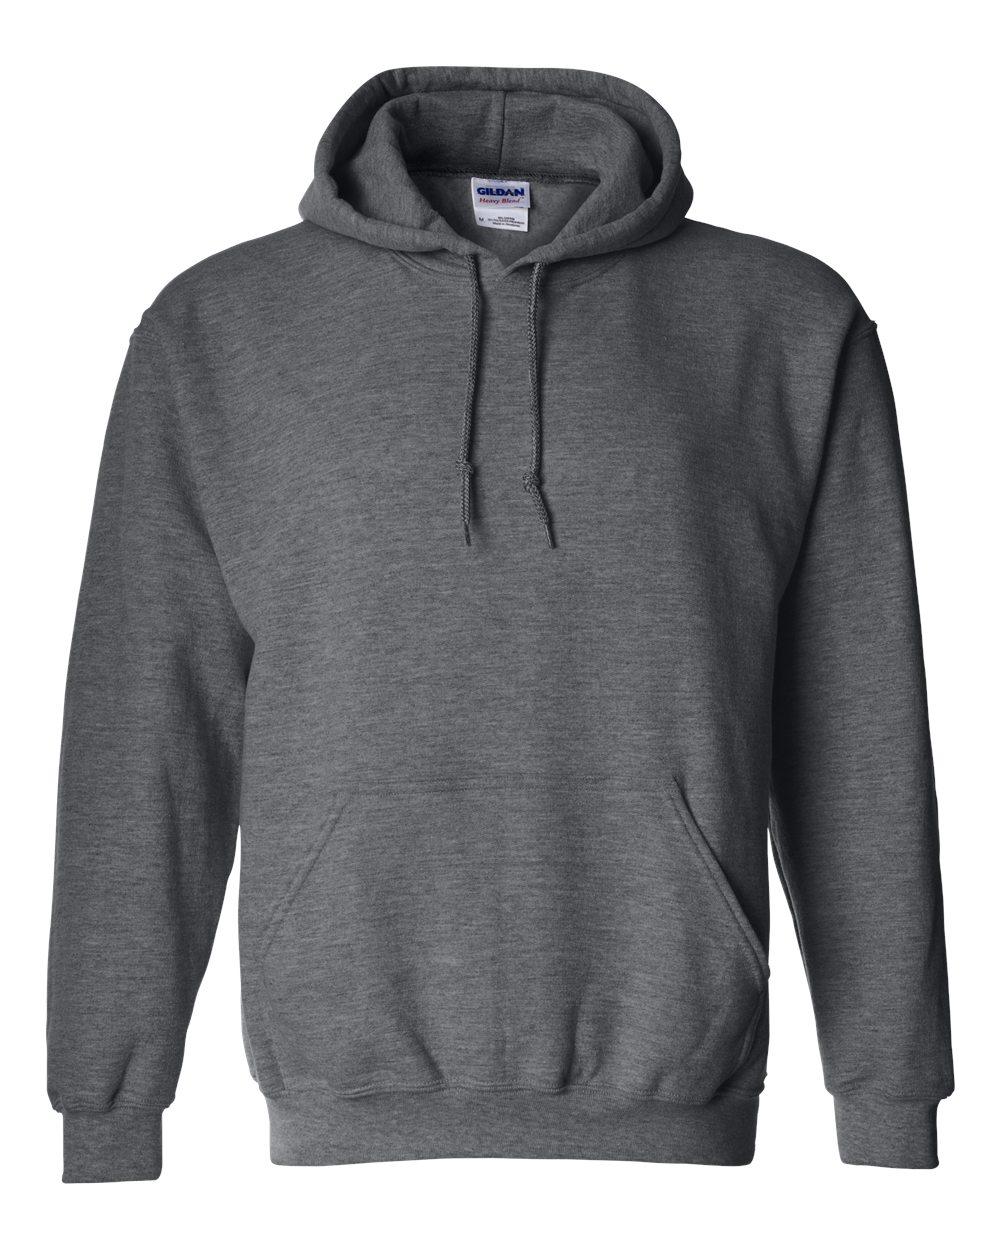 Gildan-Mens-Blank-Hoodie-Heavy-Blend-Hooded-Sweatshirt-18500-up-to-5XL thumbnail 15